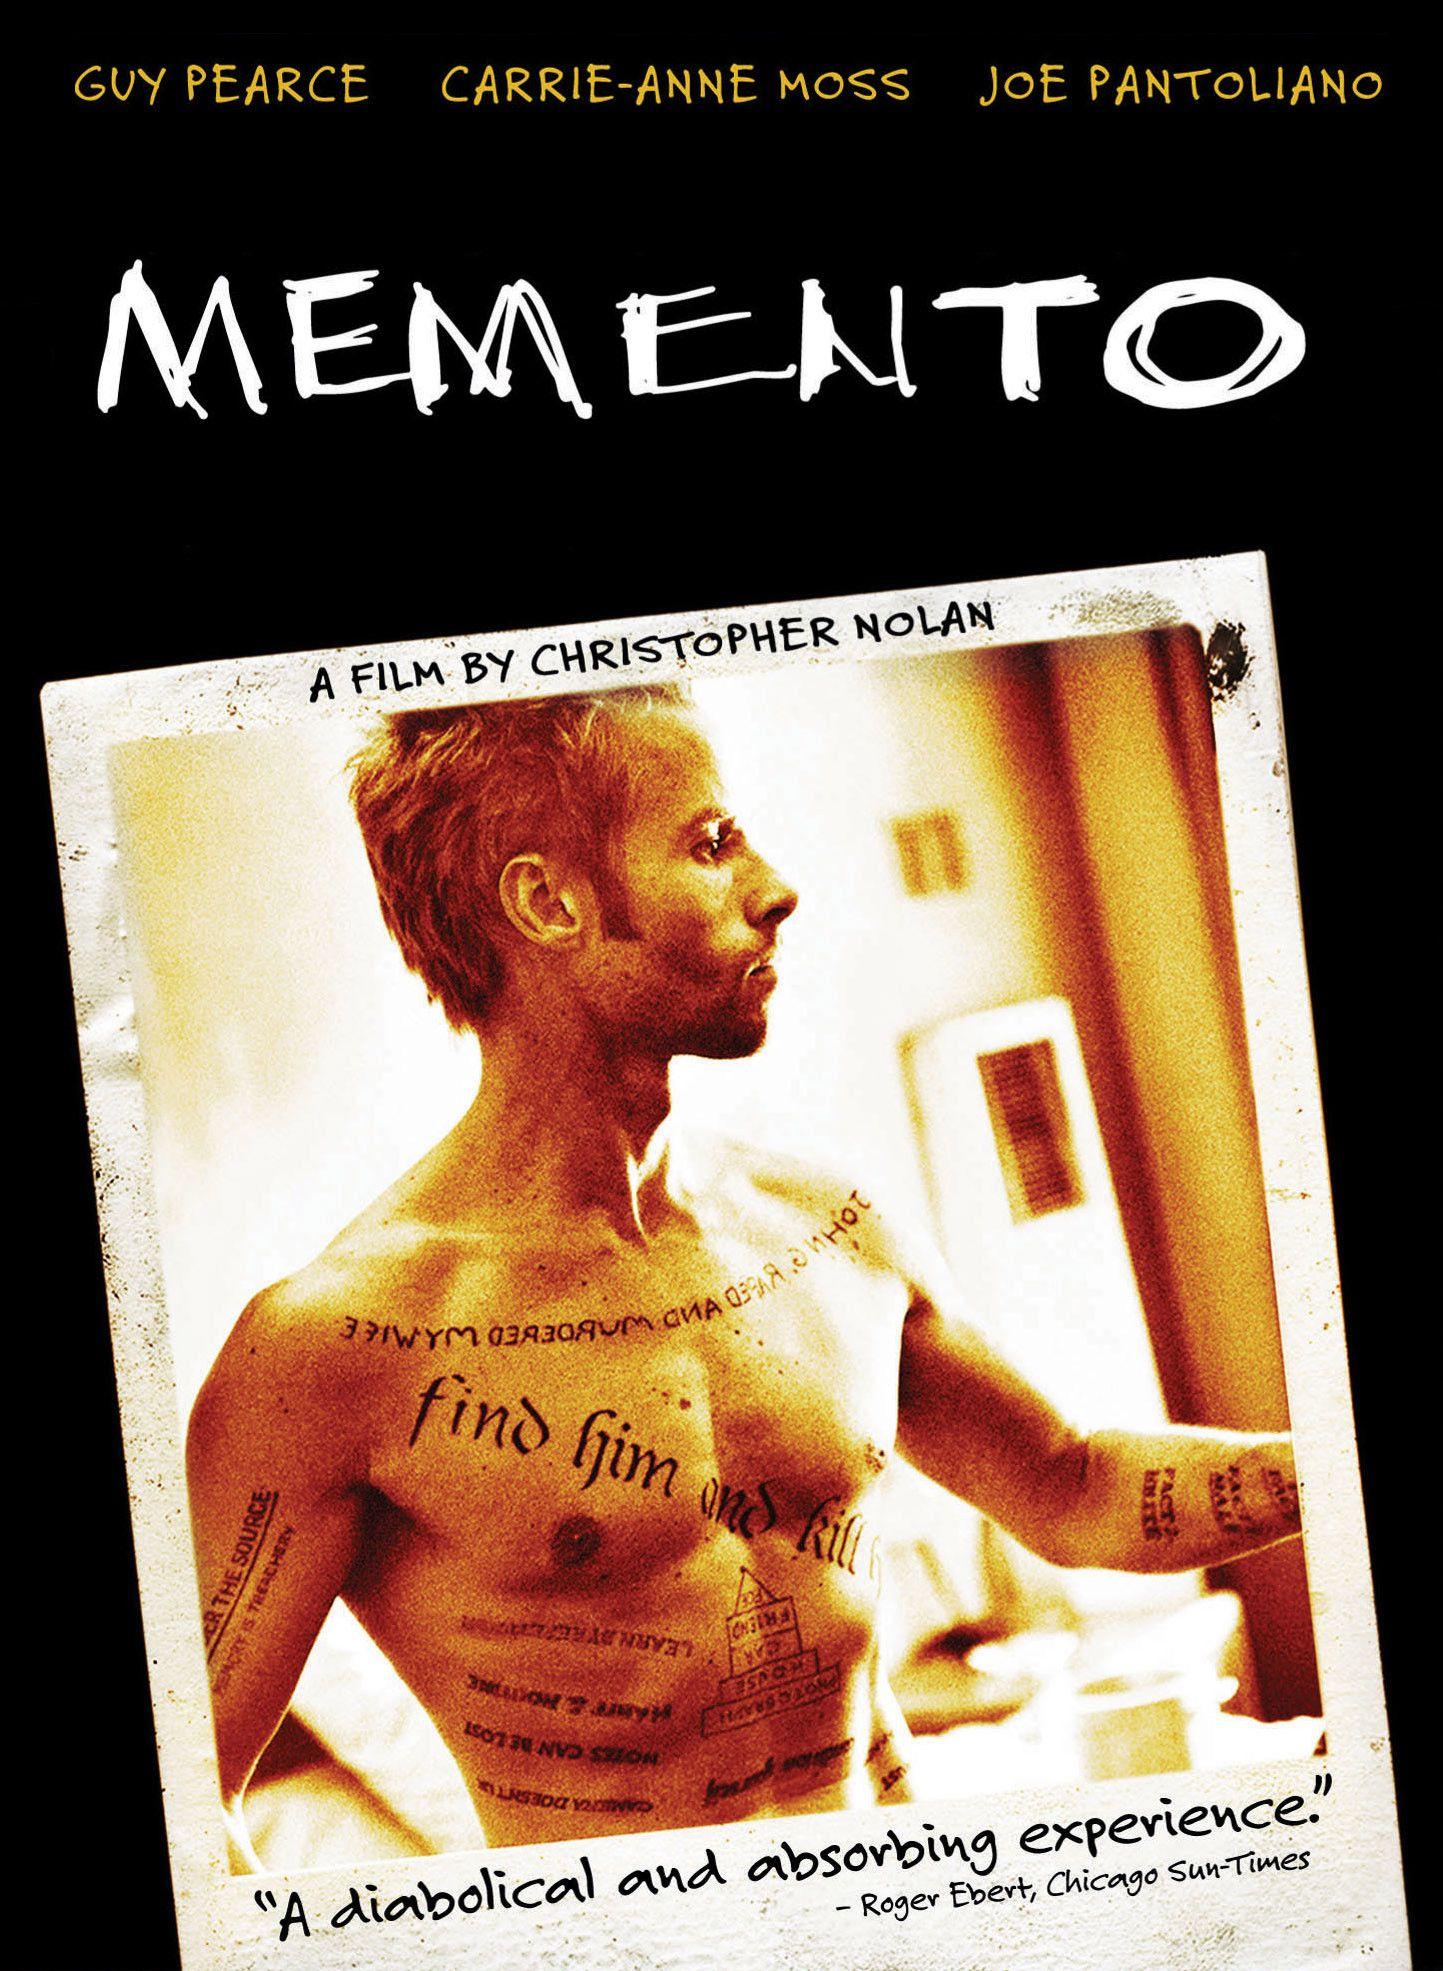 Memento 2000 Best Psychological Thriller Movies Memento Movie Psychological Thriller Movies